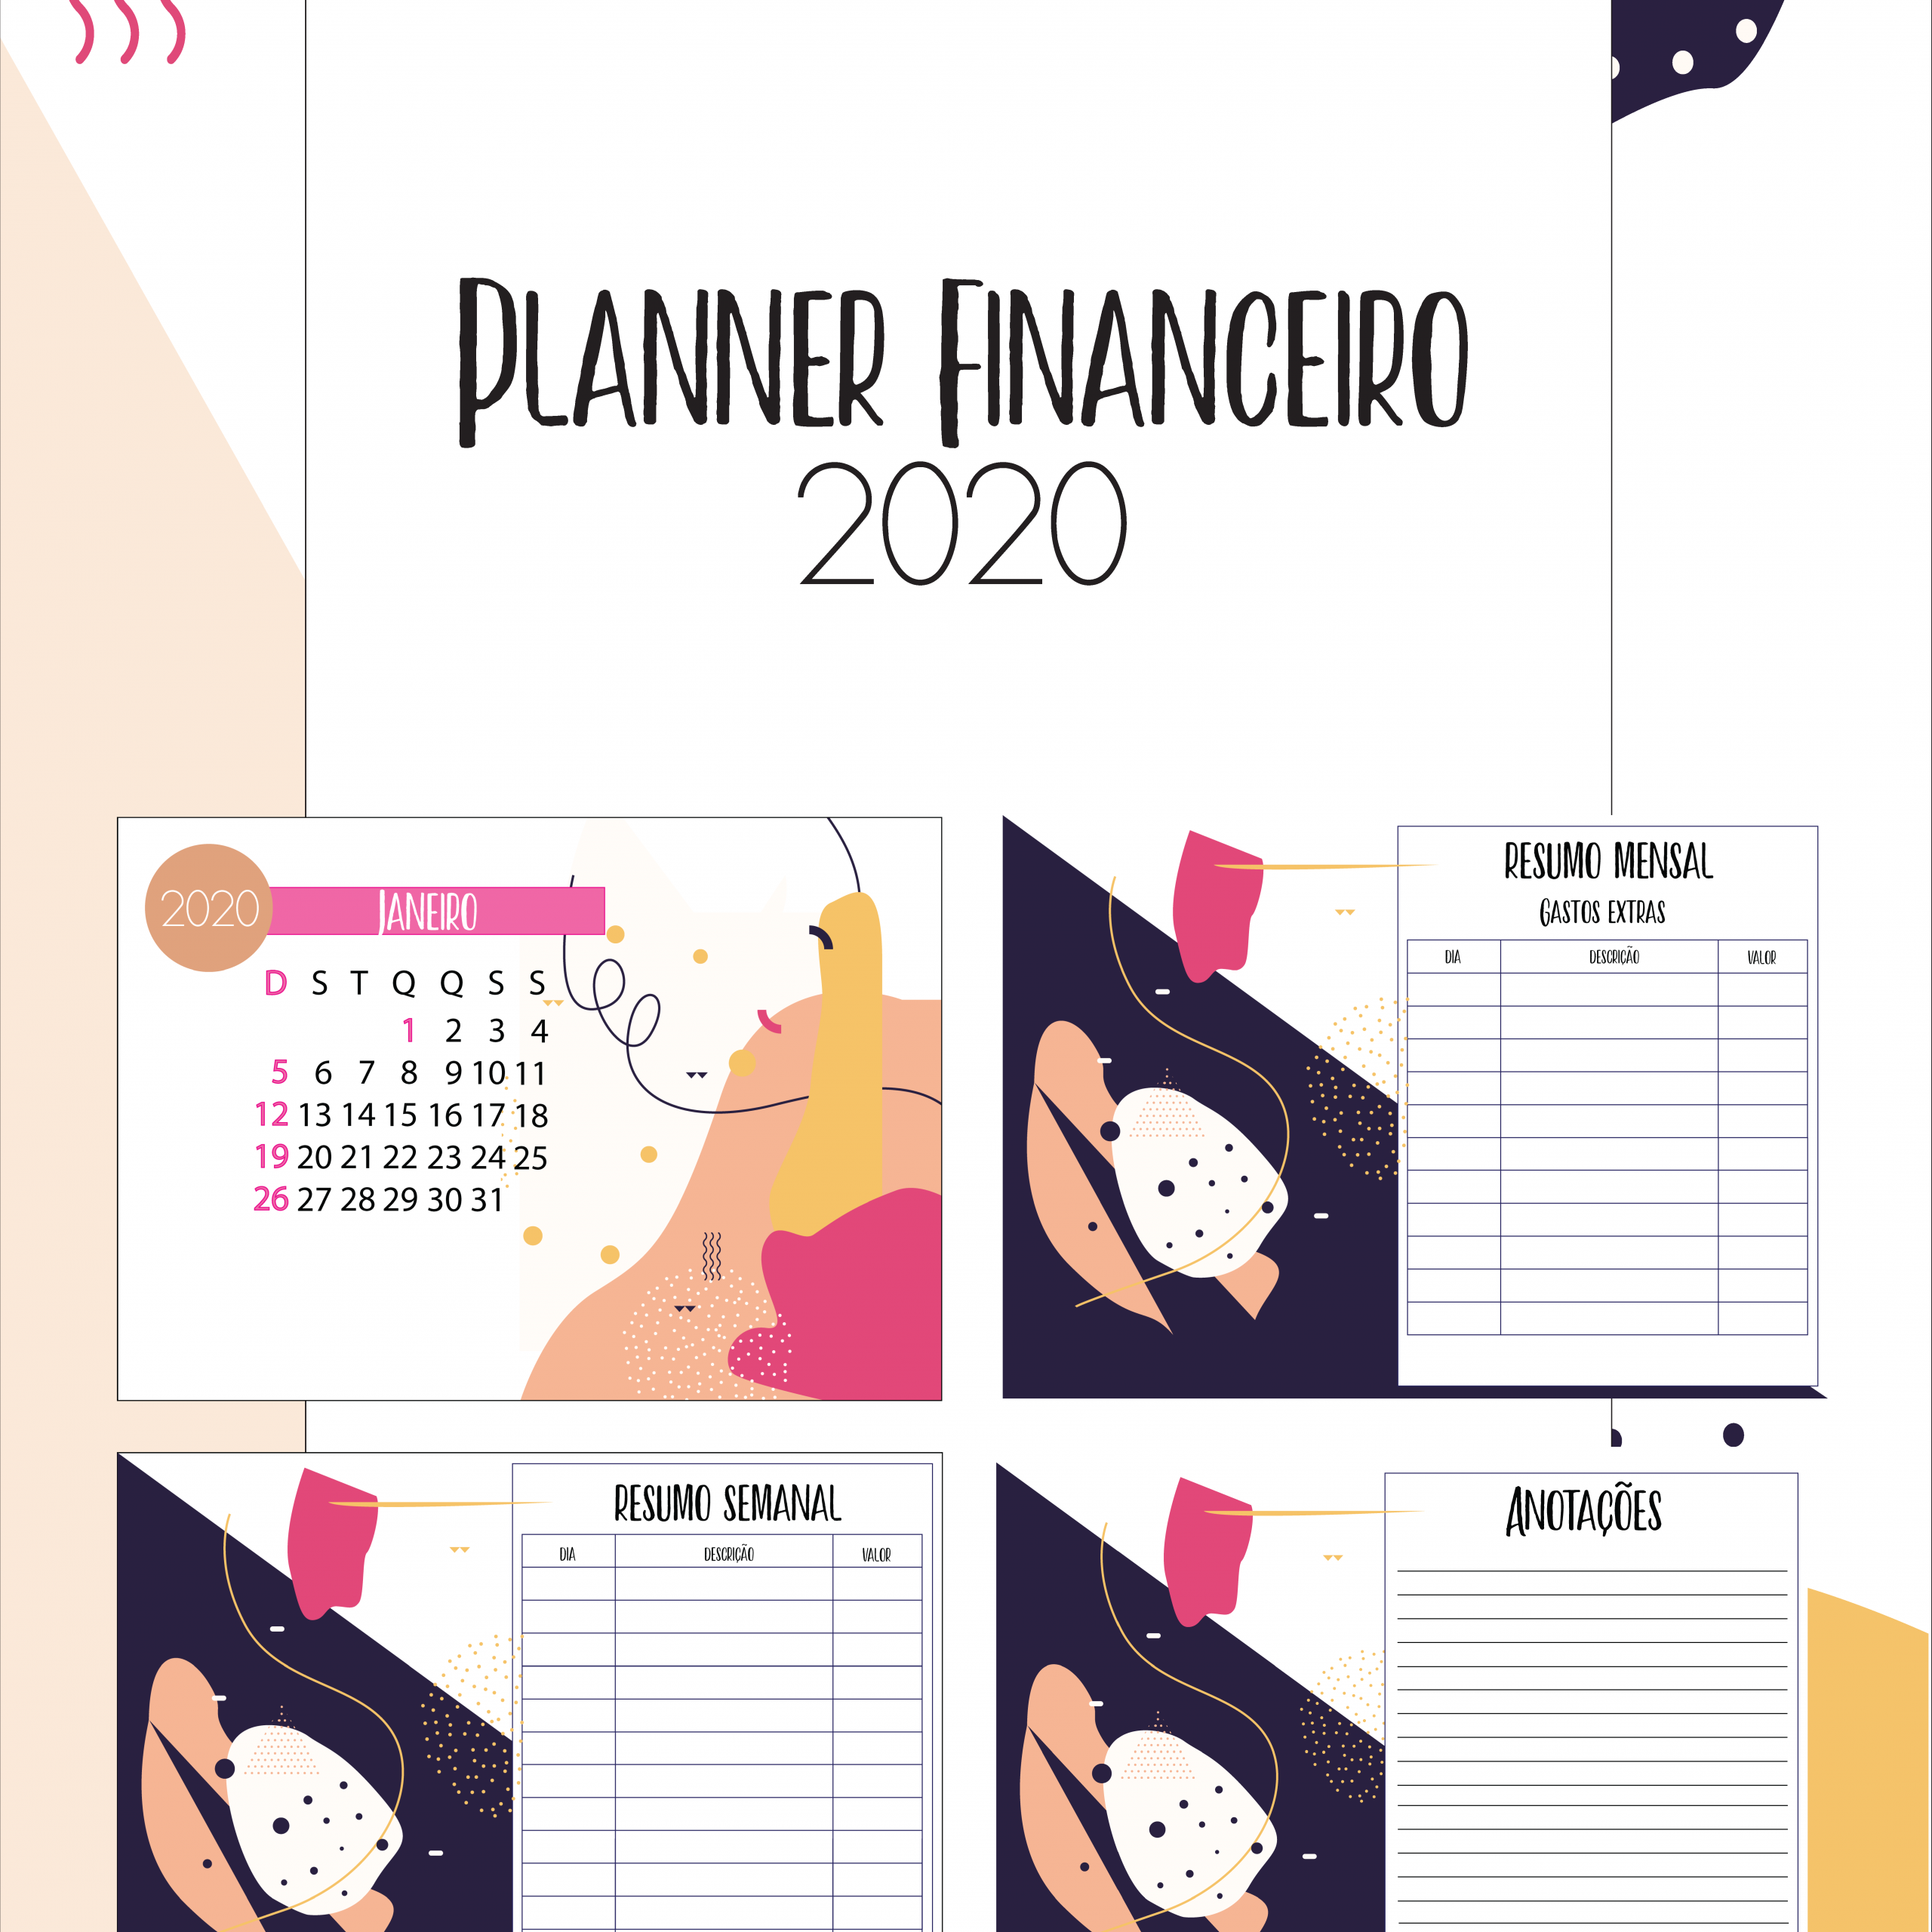 plannerfinanceiro2020